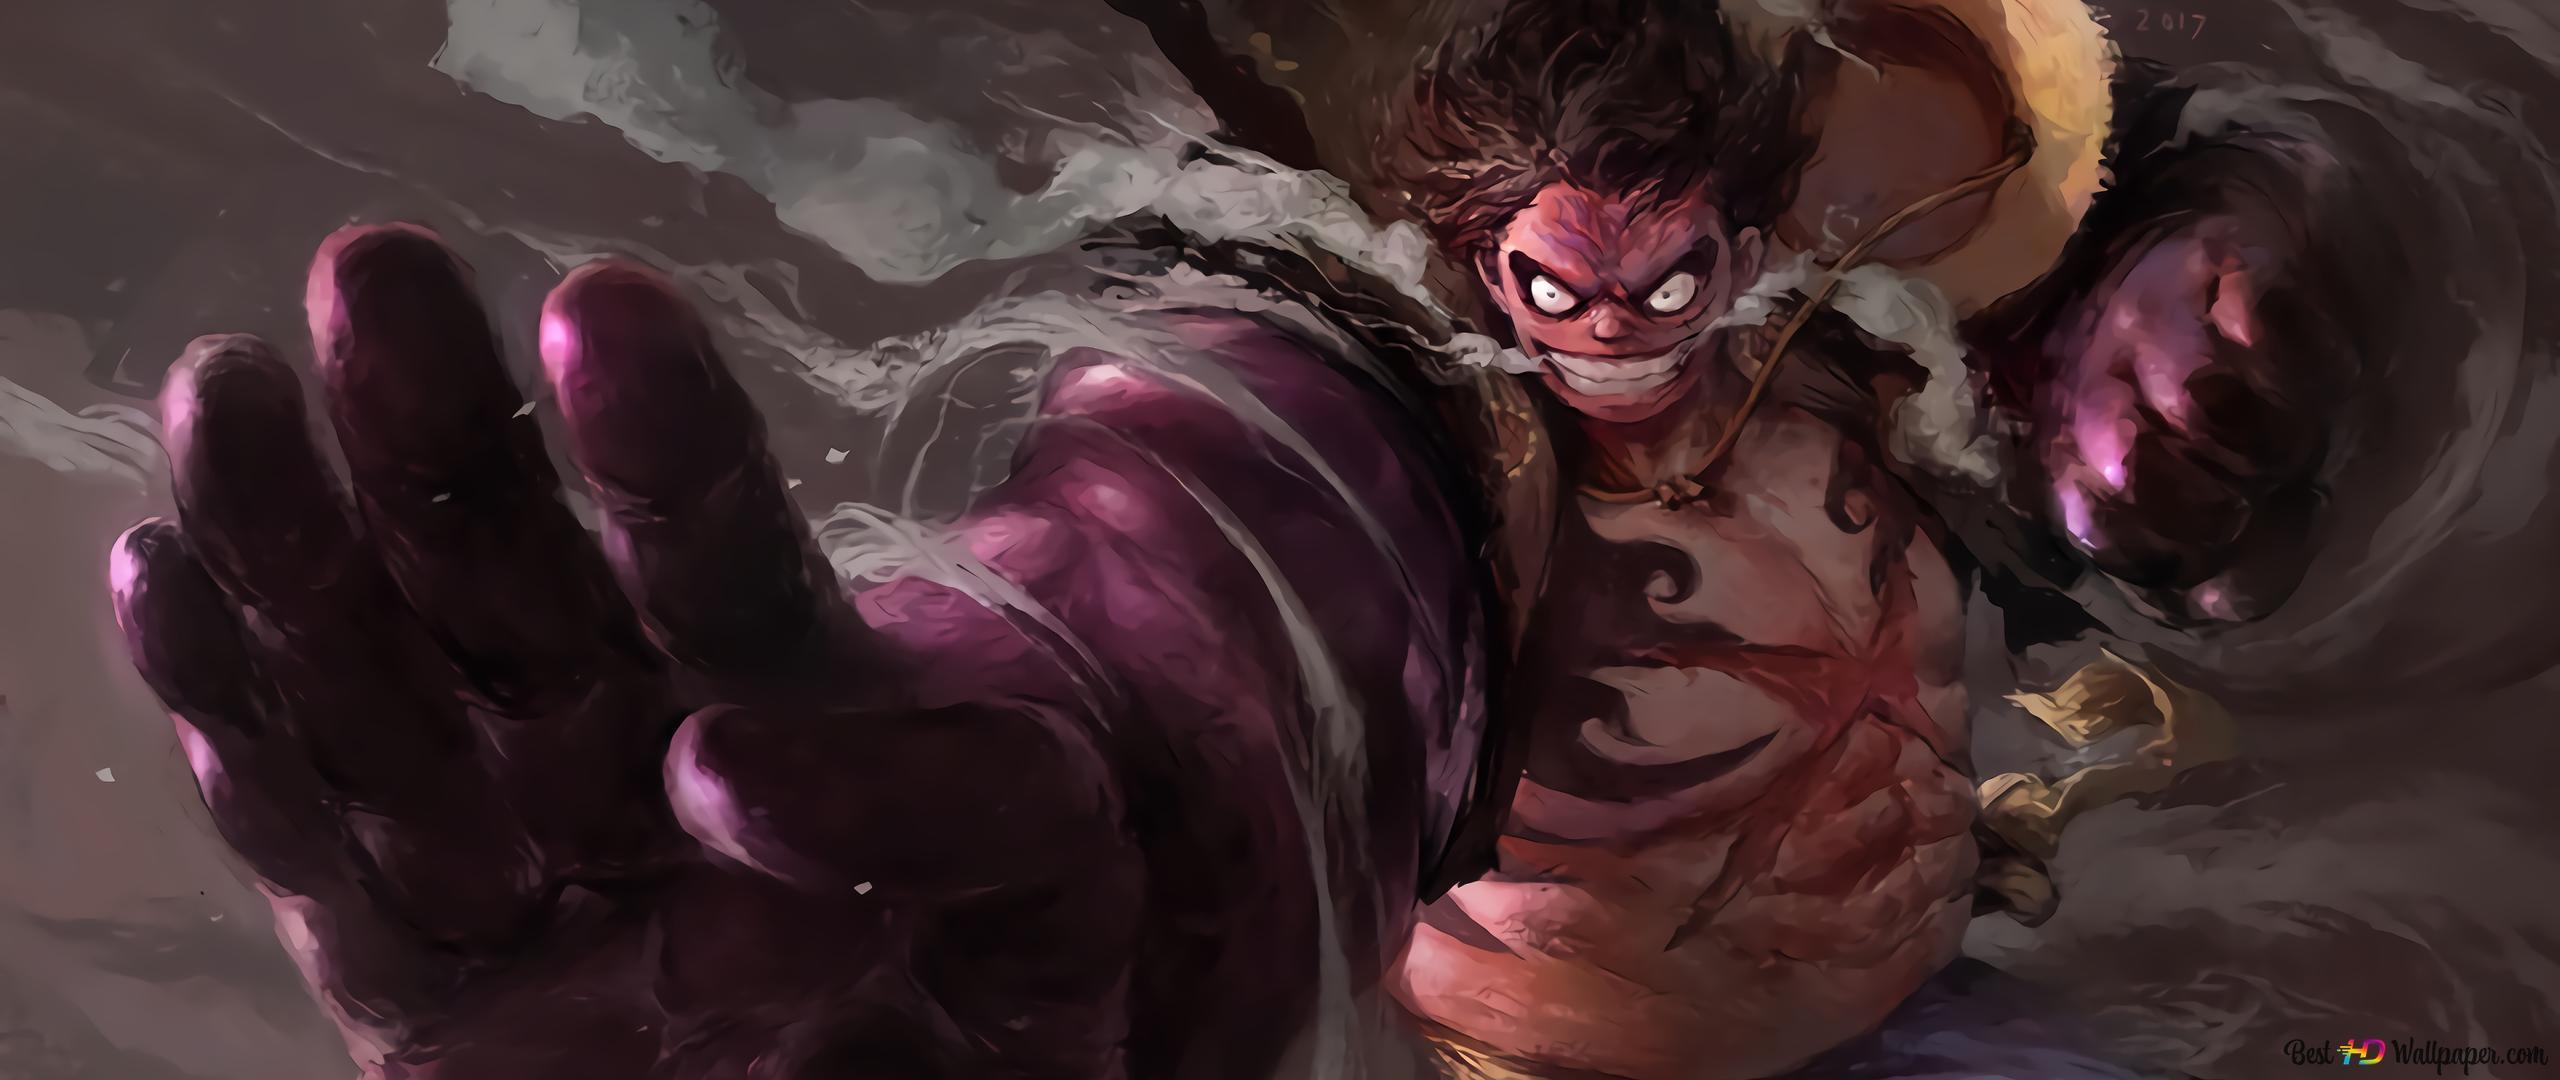 One Piece Monkey D Luffy Gang Vierter Boundman Hd